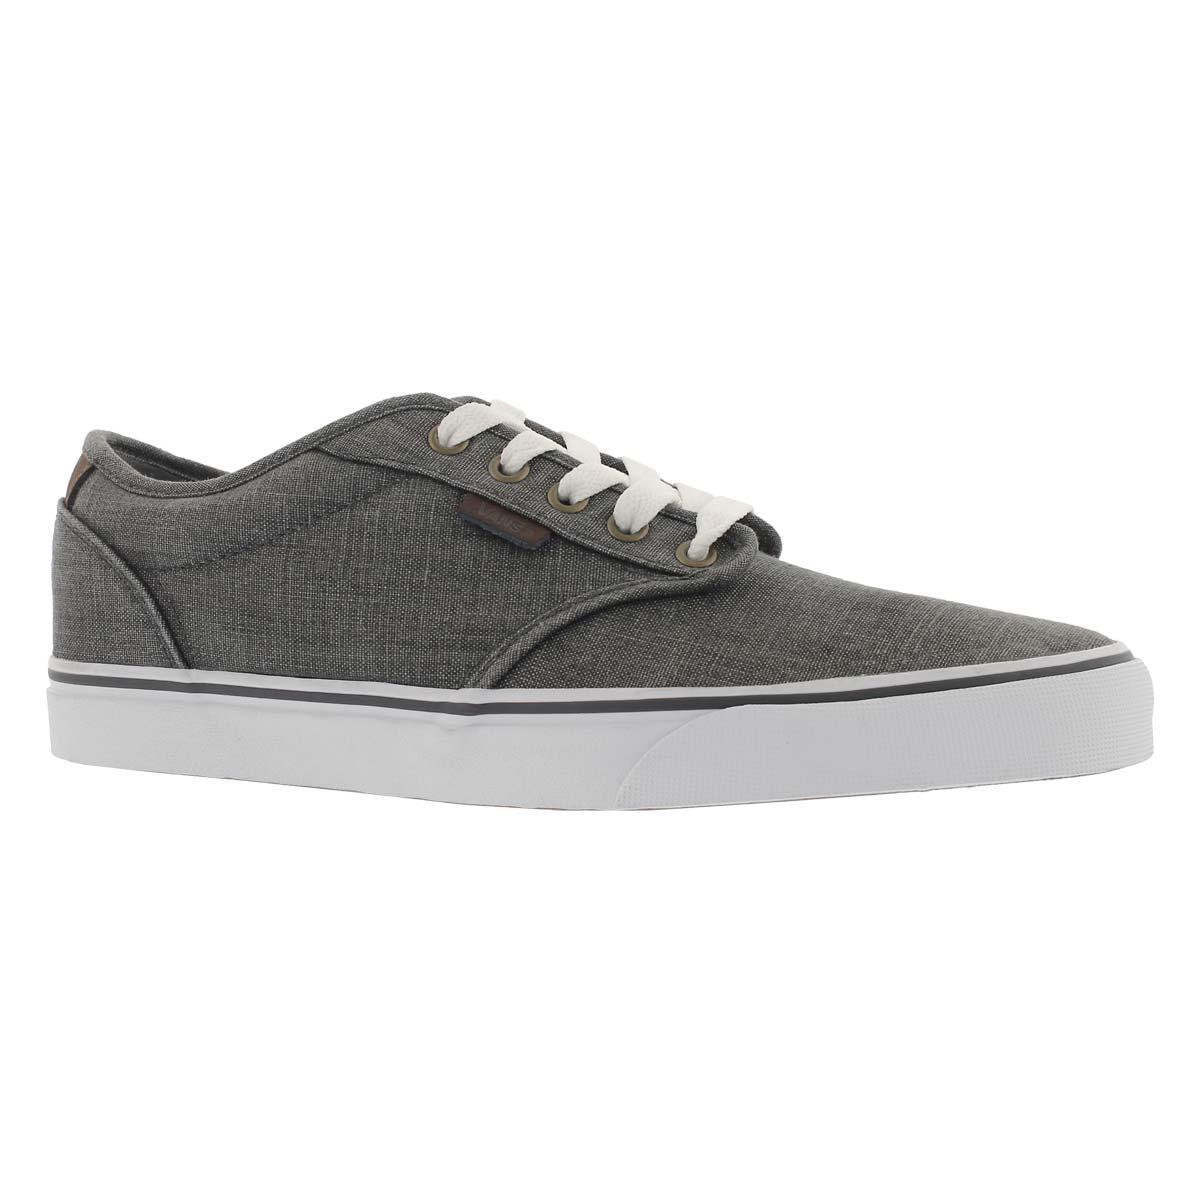 Men's ATWOOD DELUXE asphalt/wht sneakers